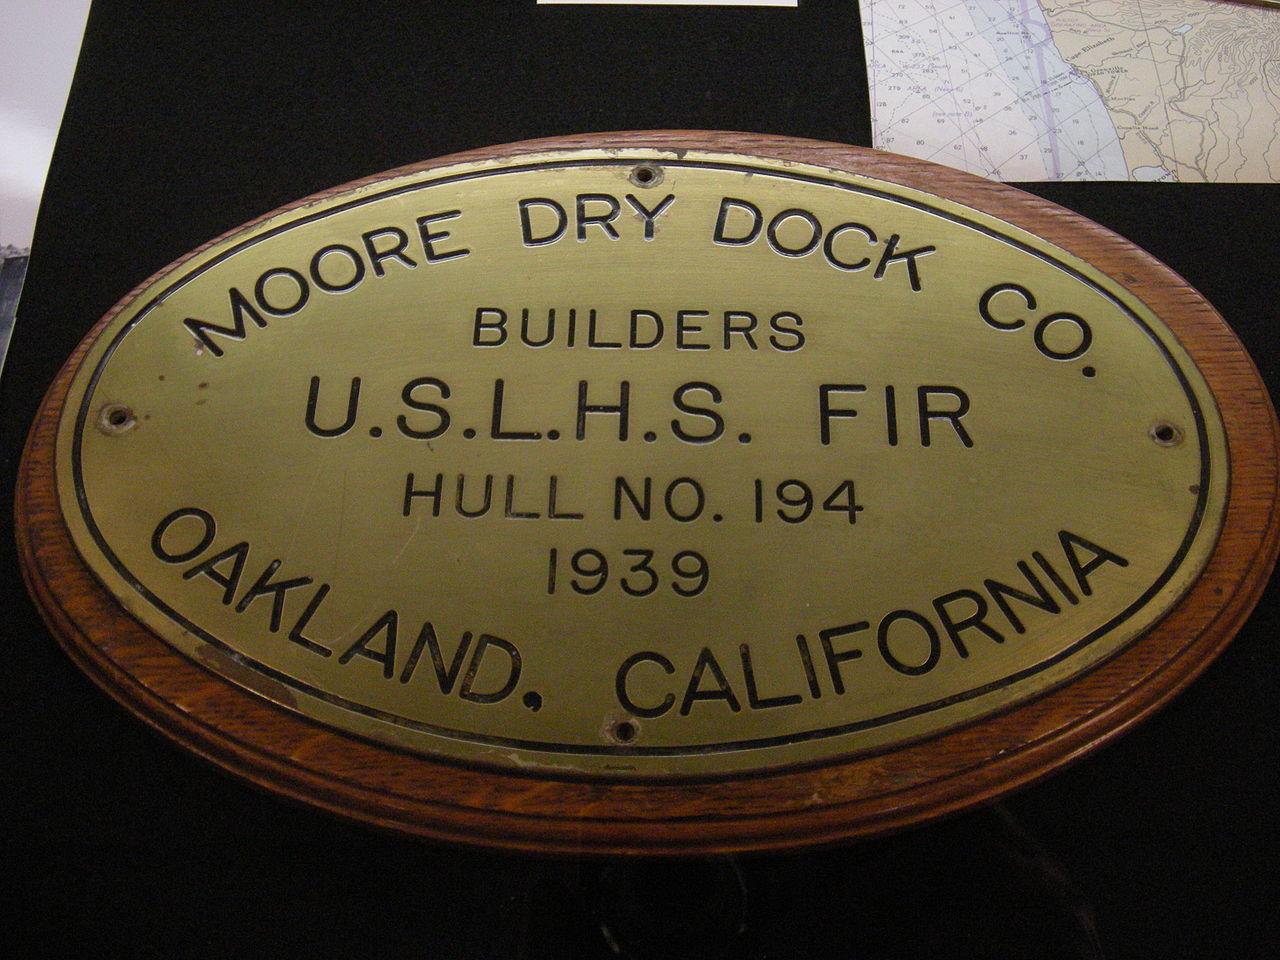 Original builder's plaque